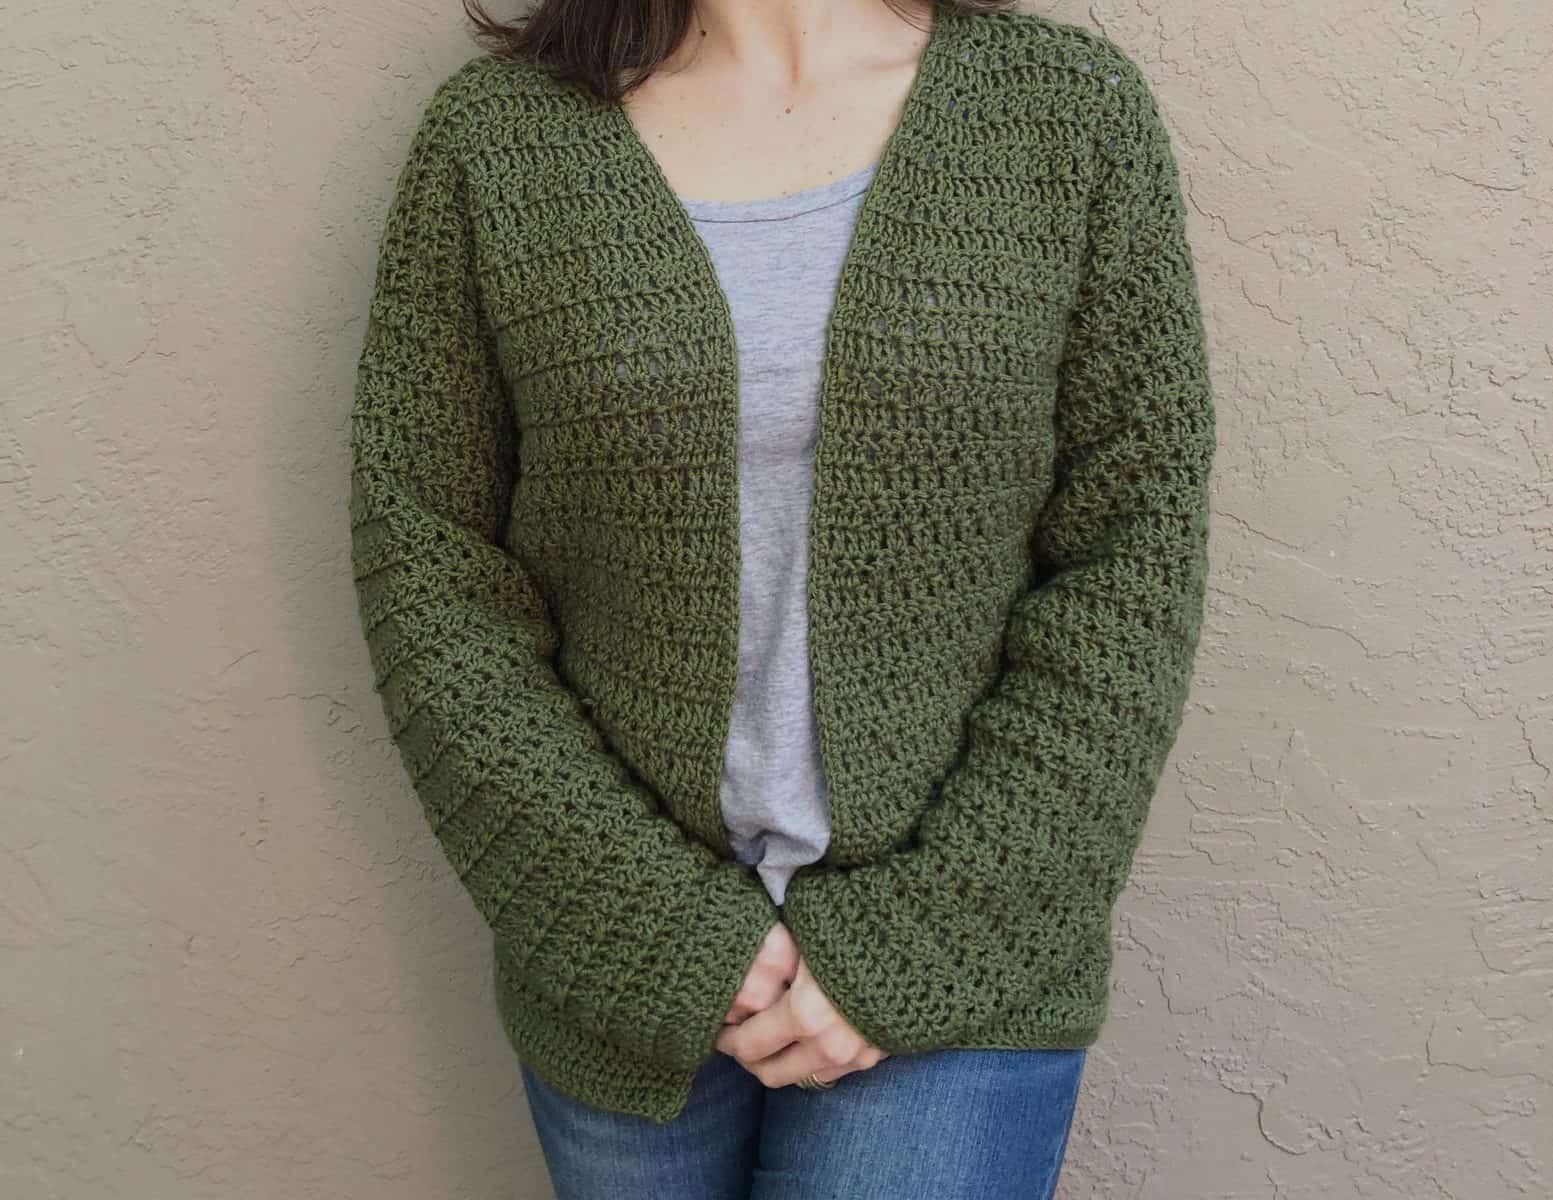 Long sleeve crochet cardigan with minimal seaming.